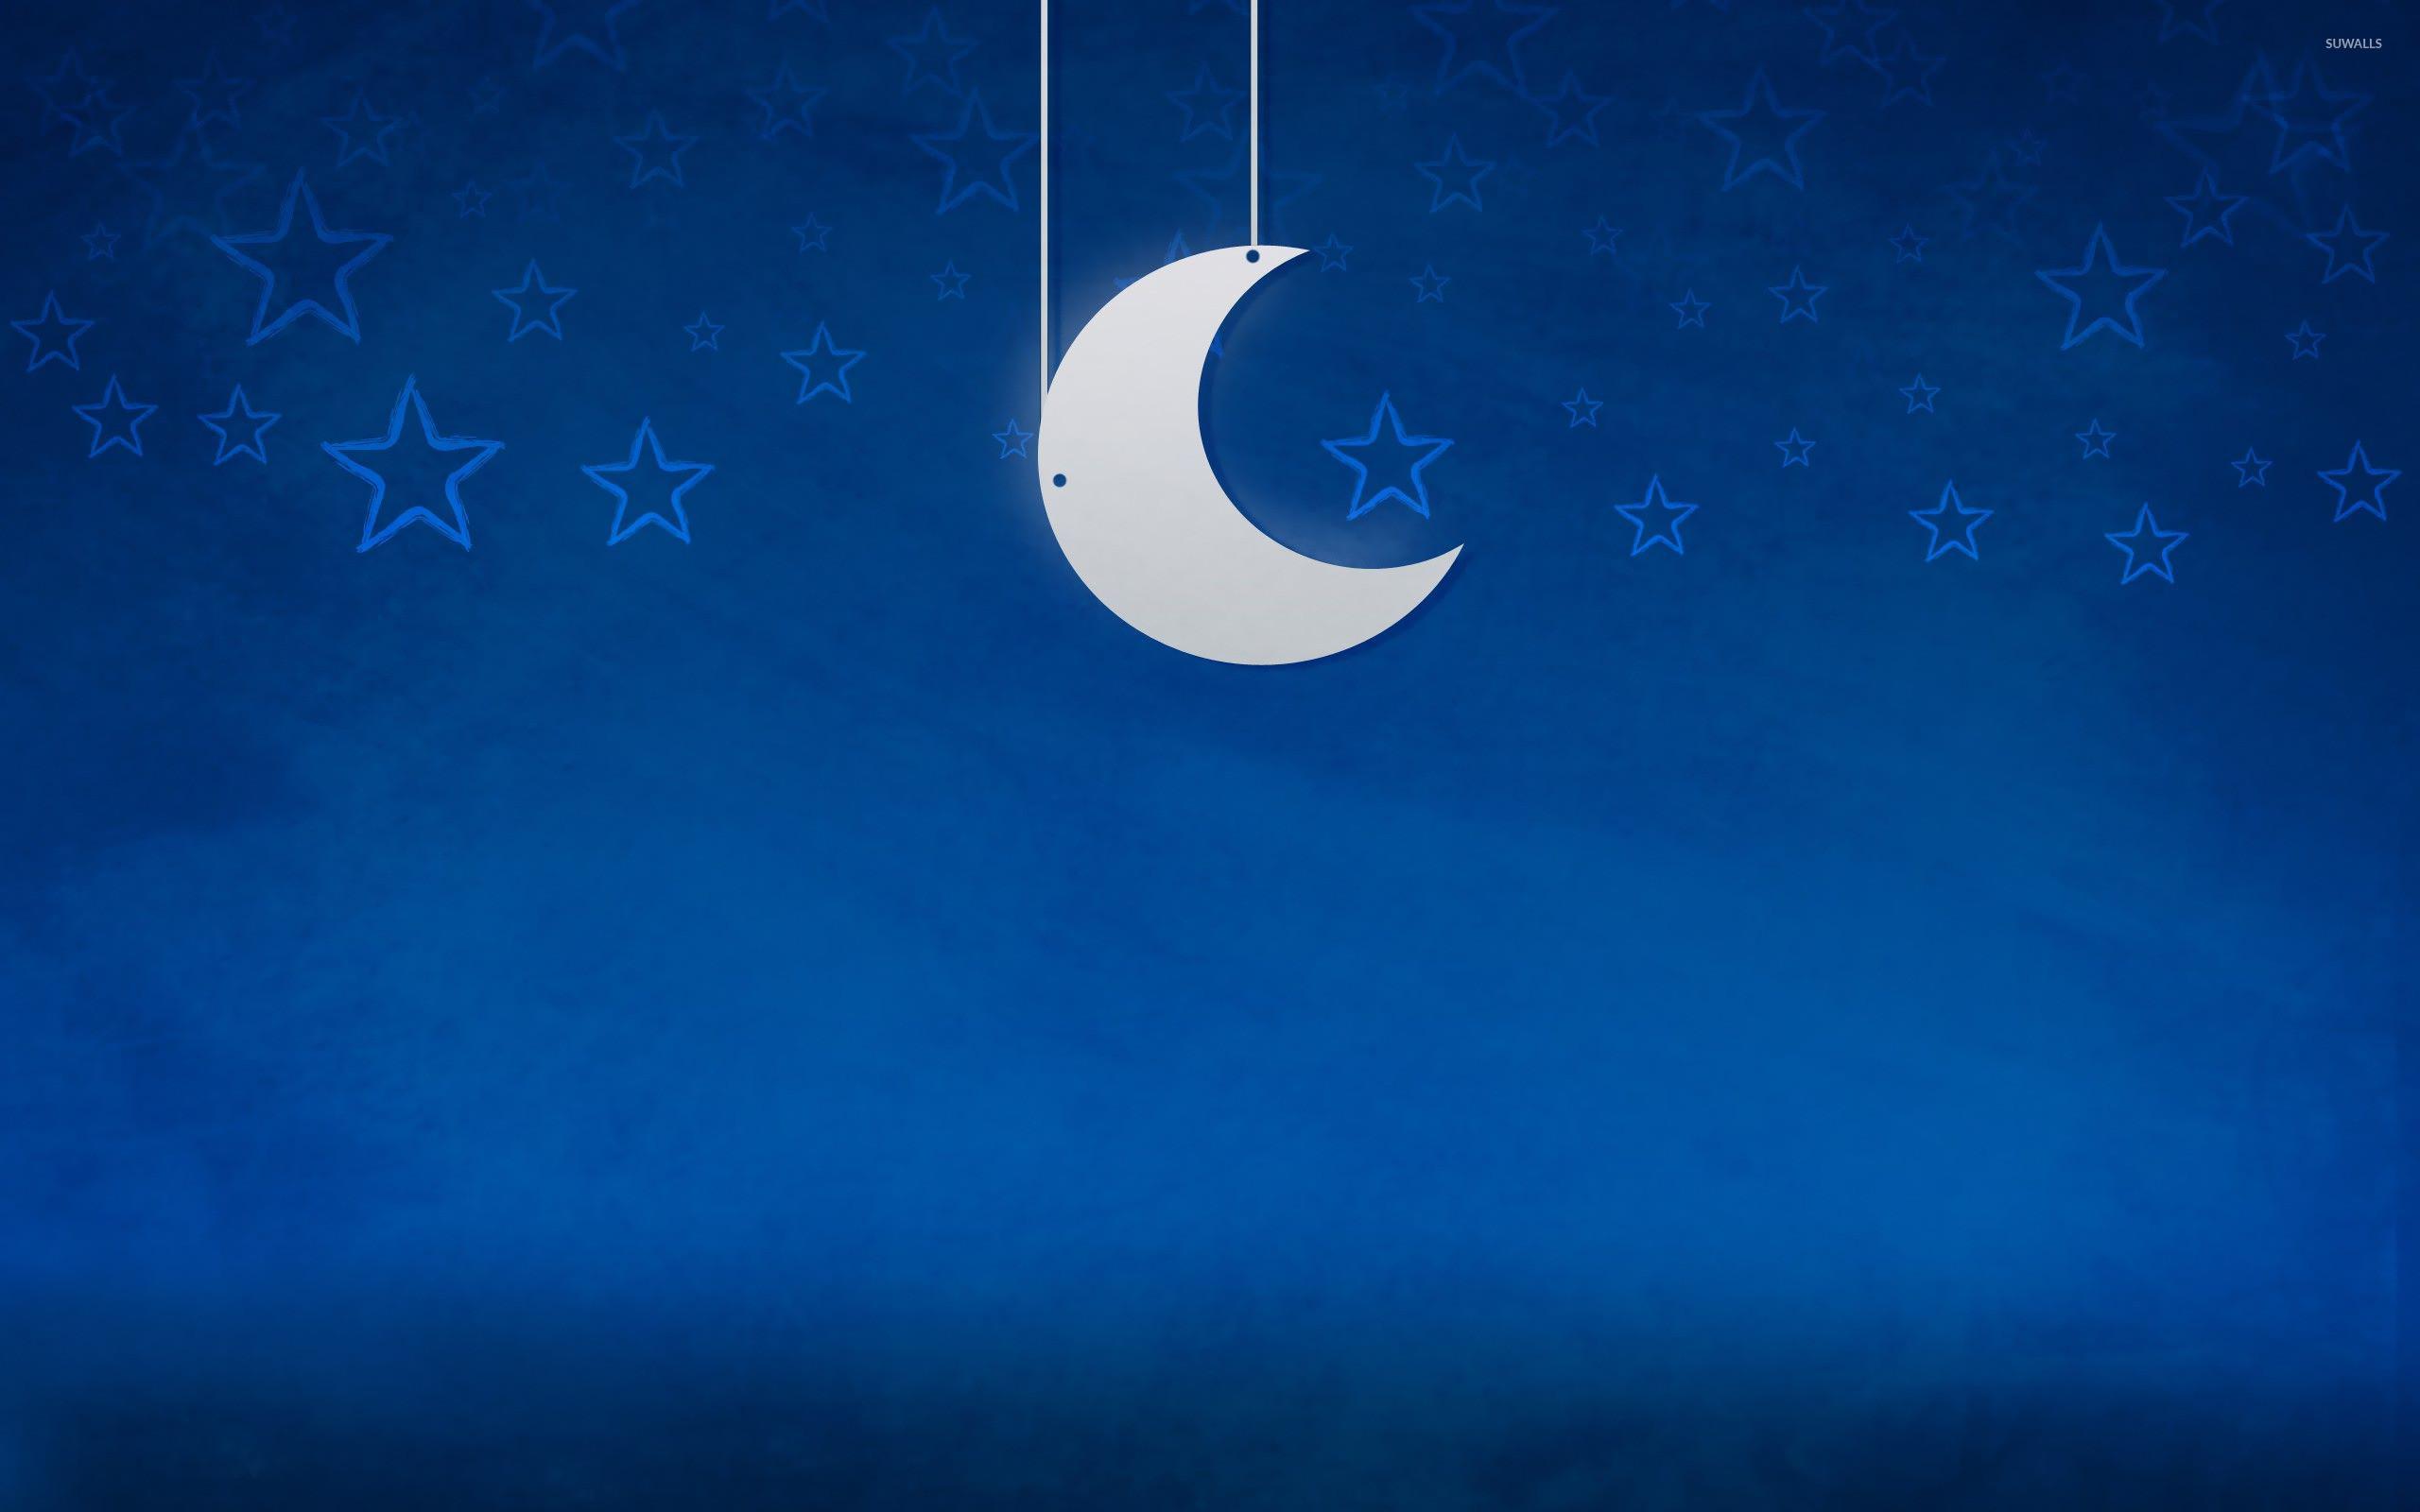 Moon and stars [2] wallpaper jpg